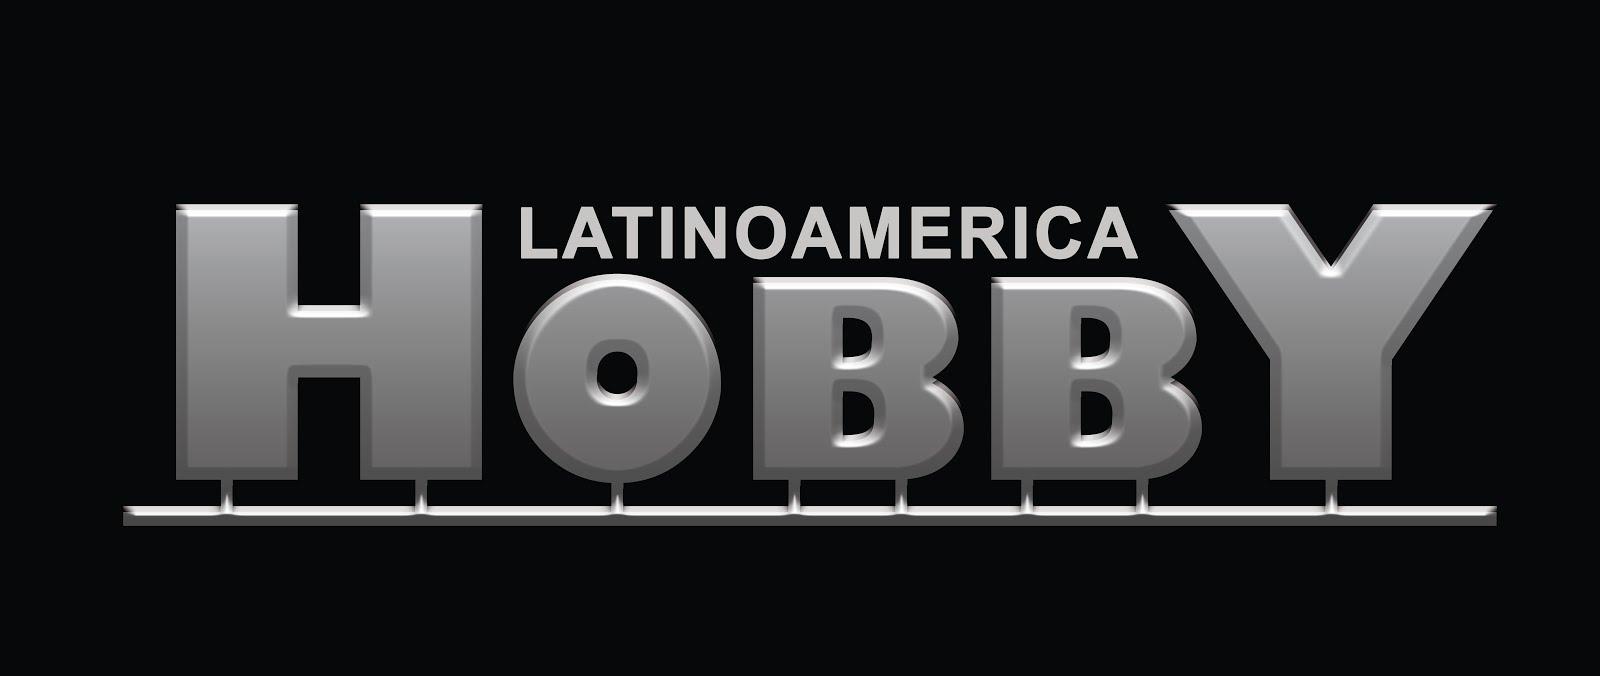 Latinoamérica Hobby